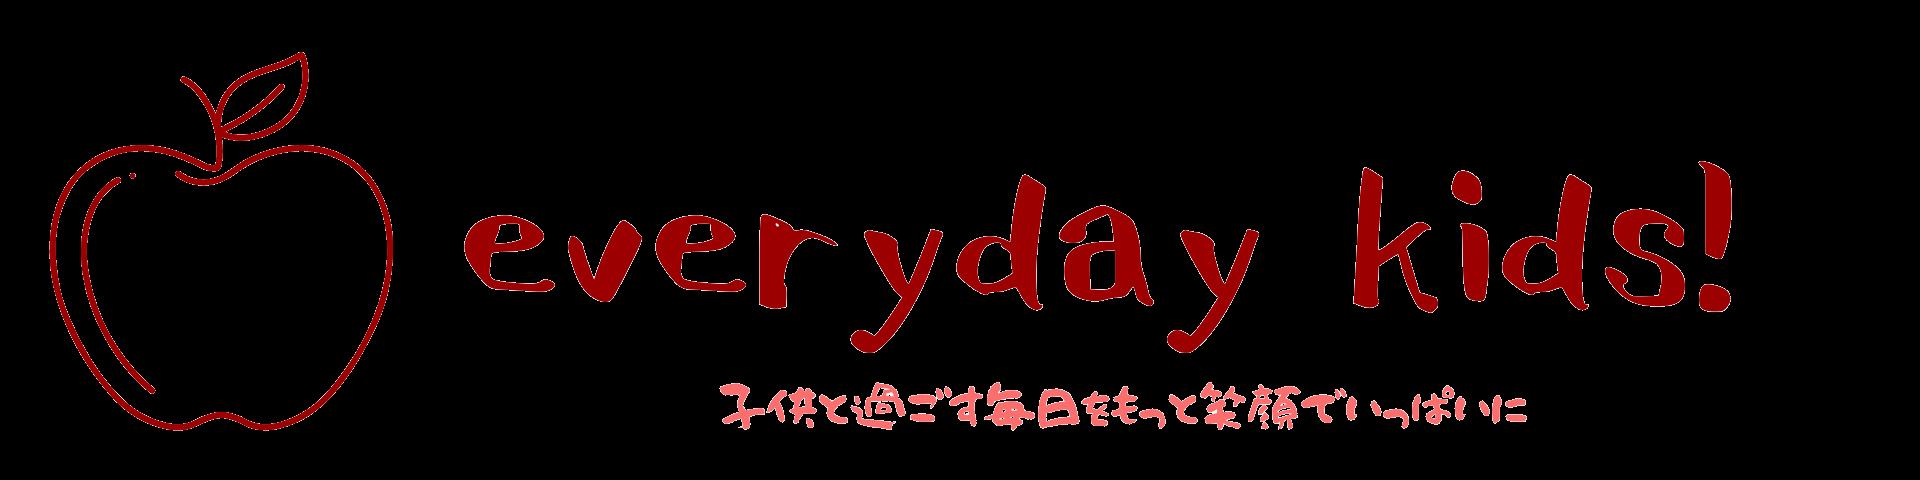 everyday kids!